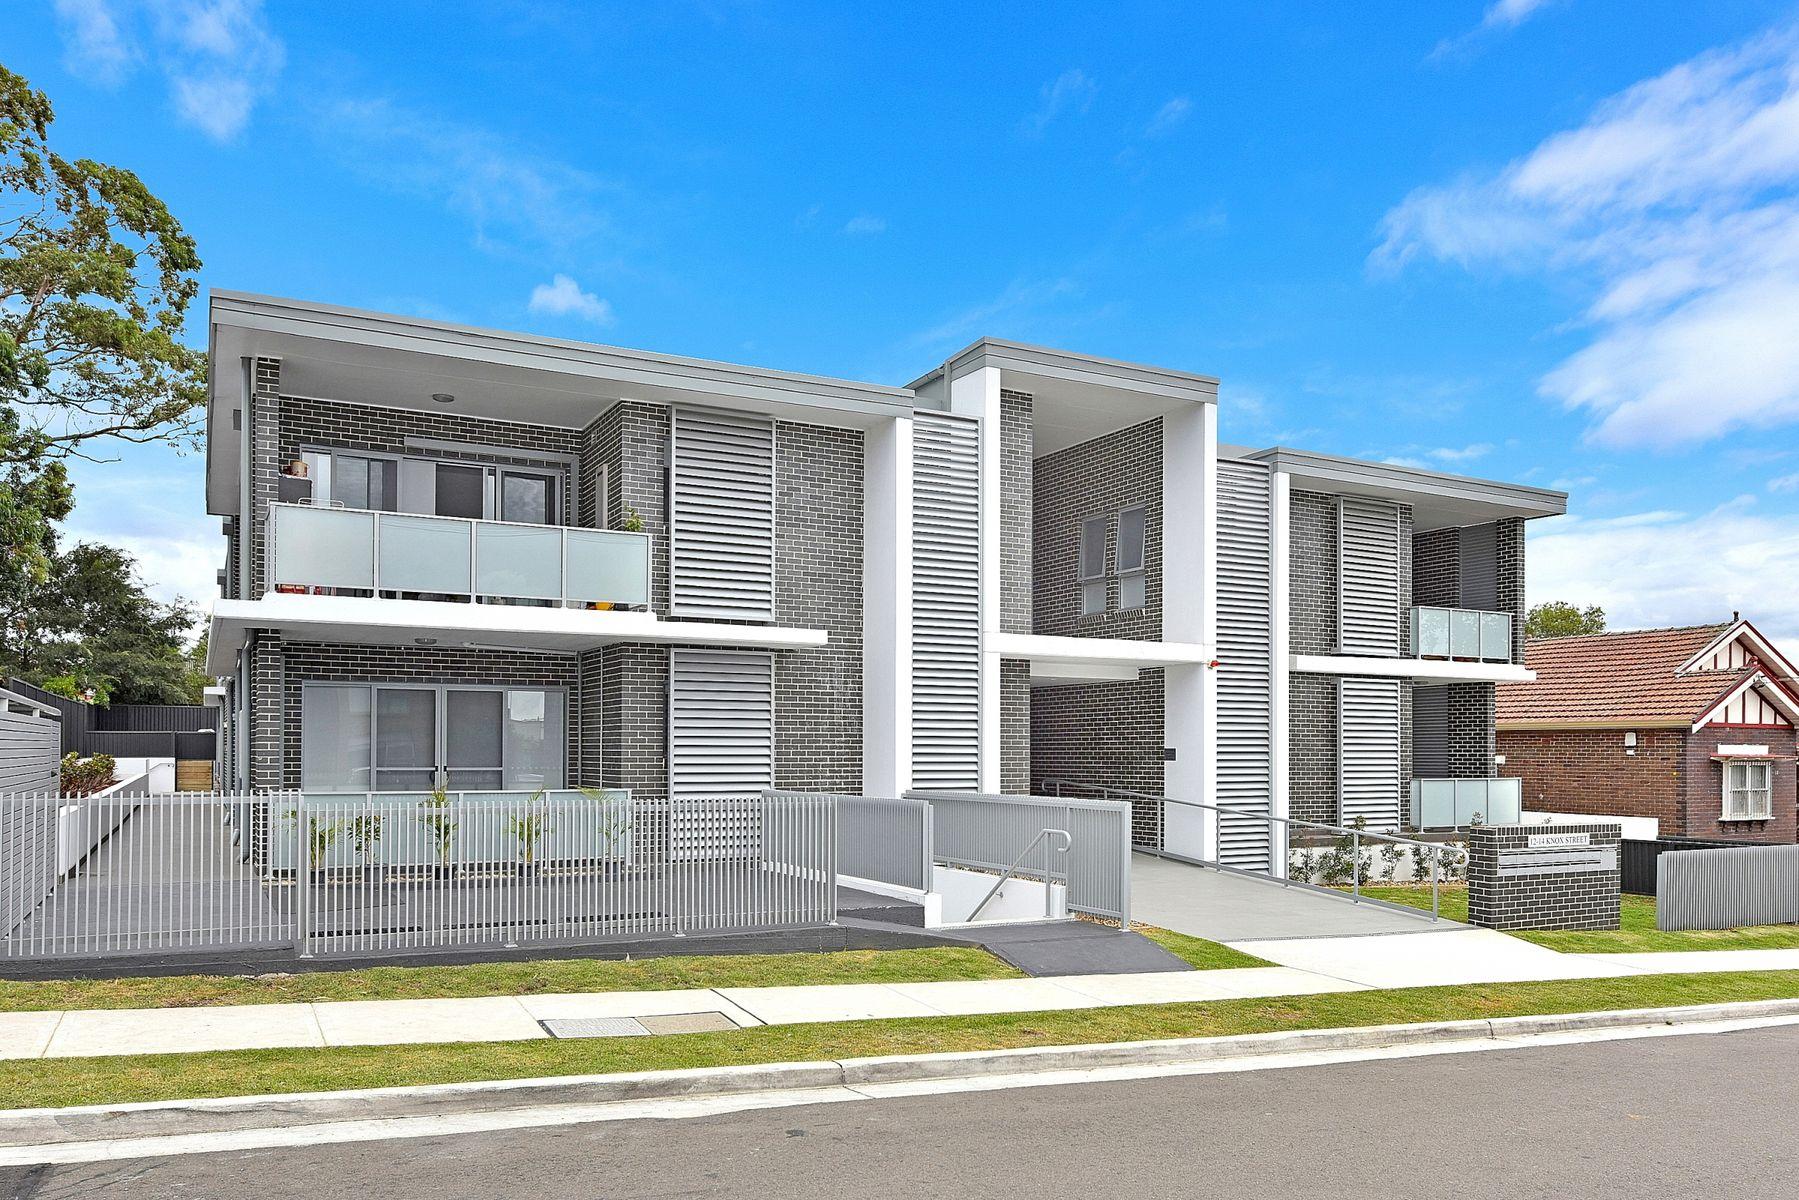 11/12-14 Knox Street, Belmore, NSW 2192